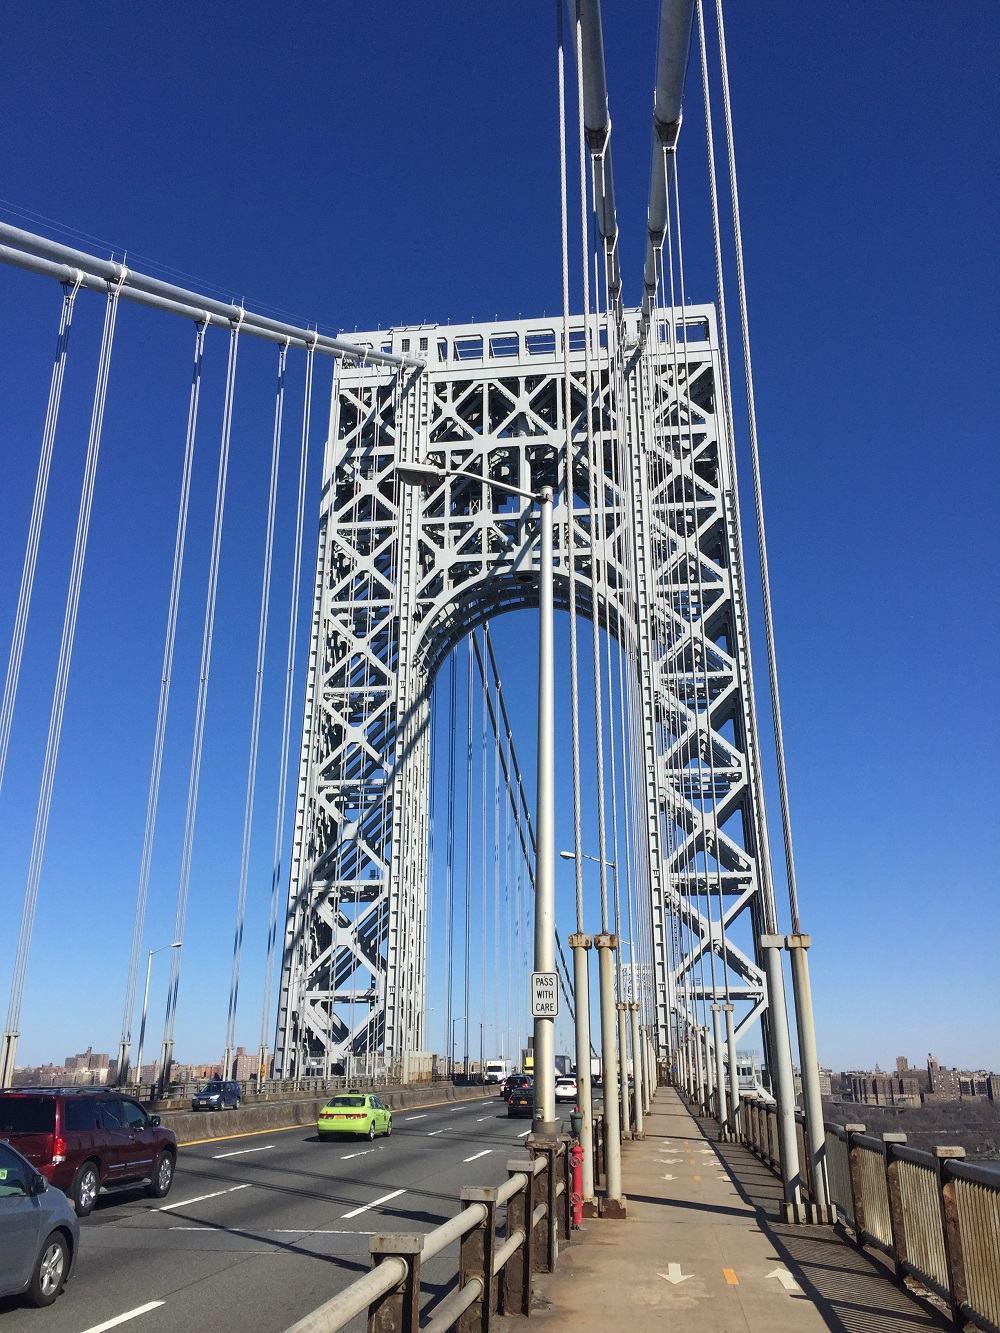 George Washington Bridge Span Upper Level Structural Steel Rehabilitation - American Bridge